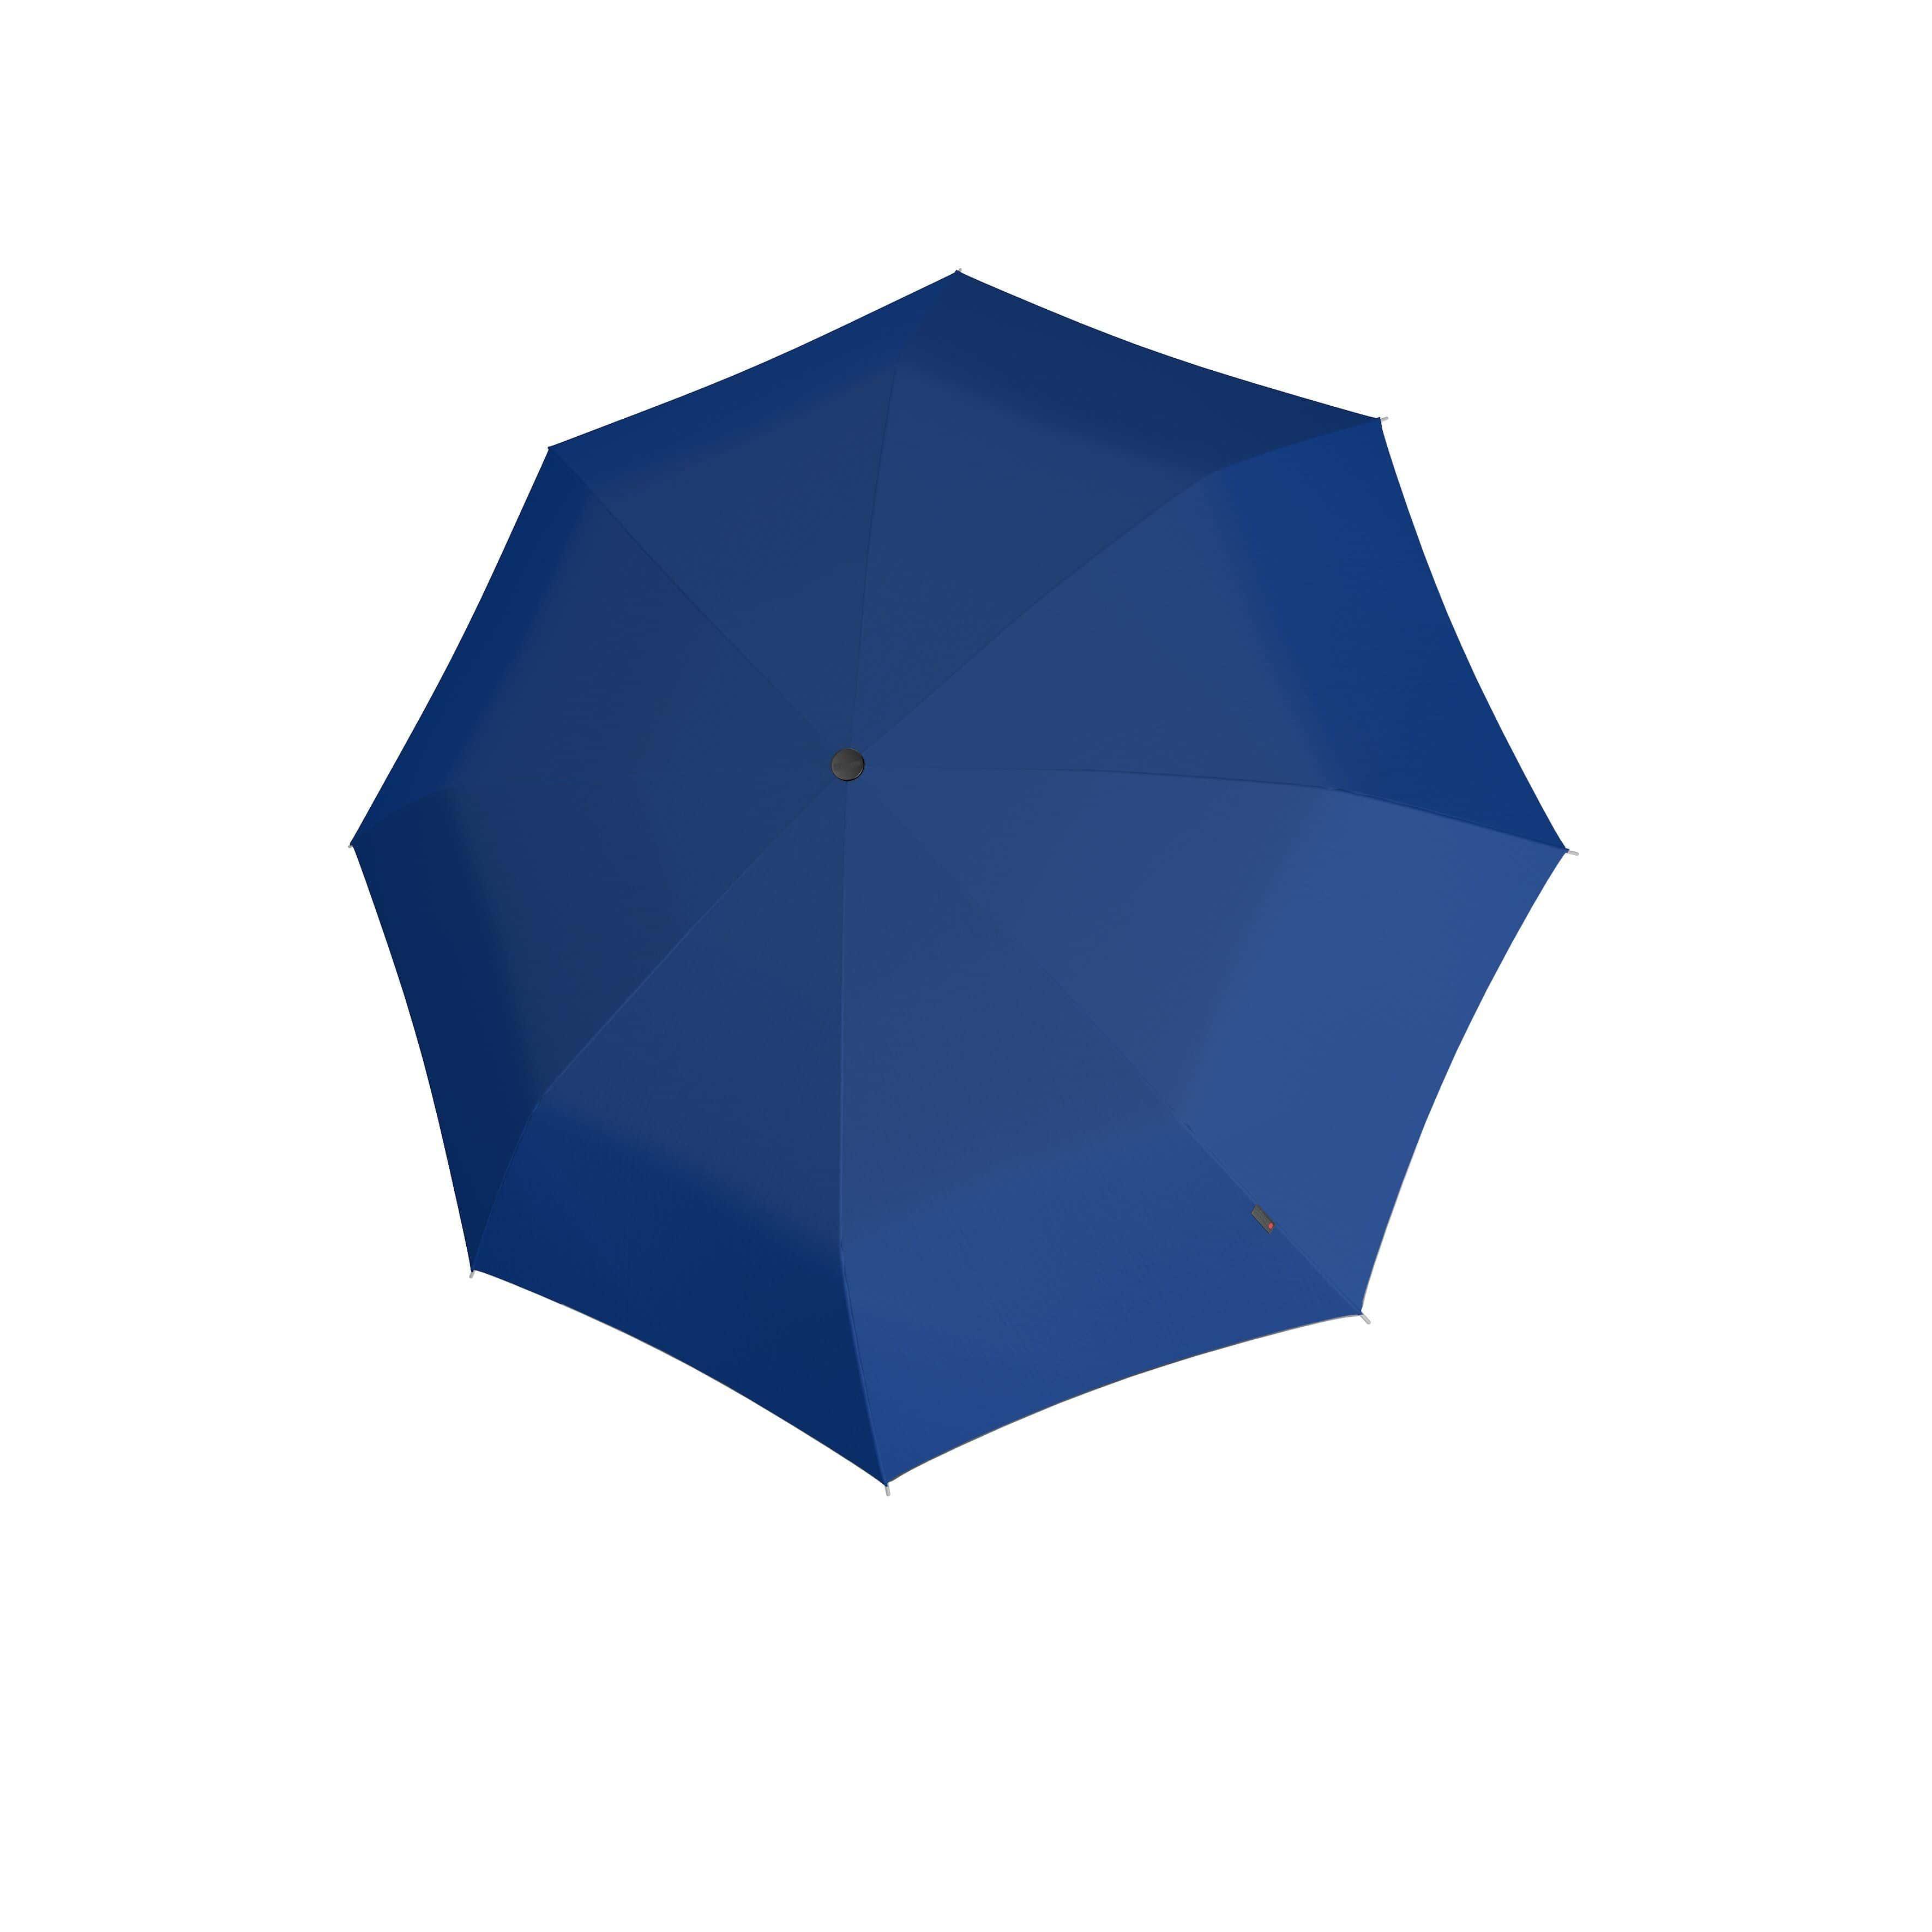 Knirps Umbrella A.200 medium duomatic - photo 2